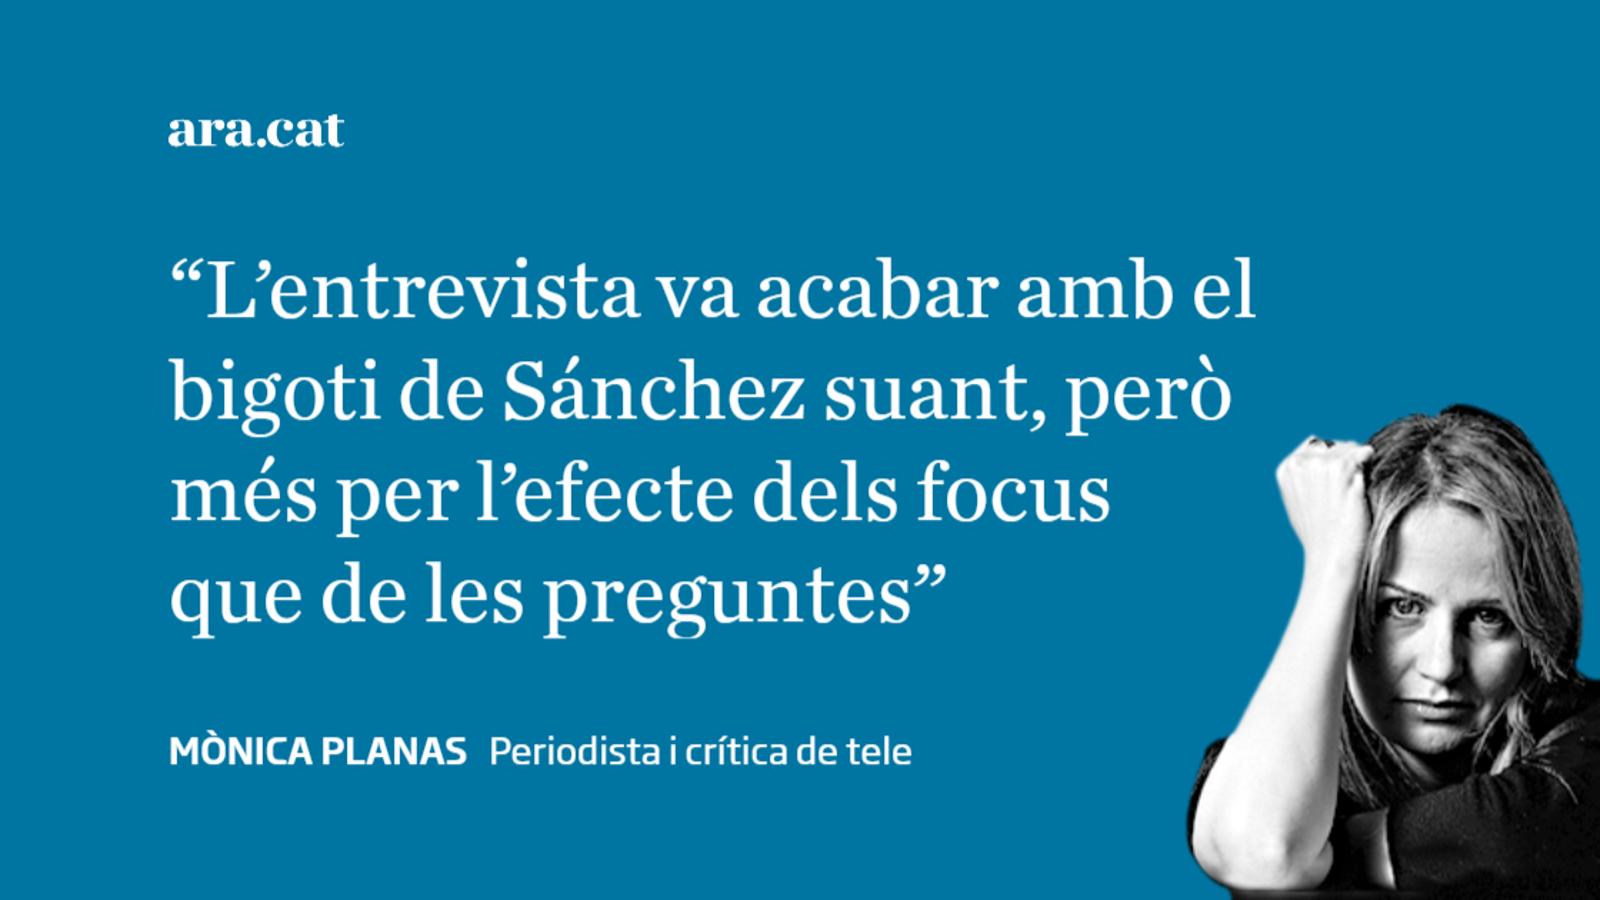 Ferreras amb Pedro Sánchez: simple tràmit